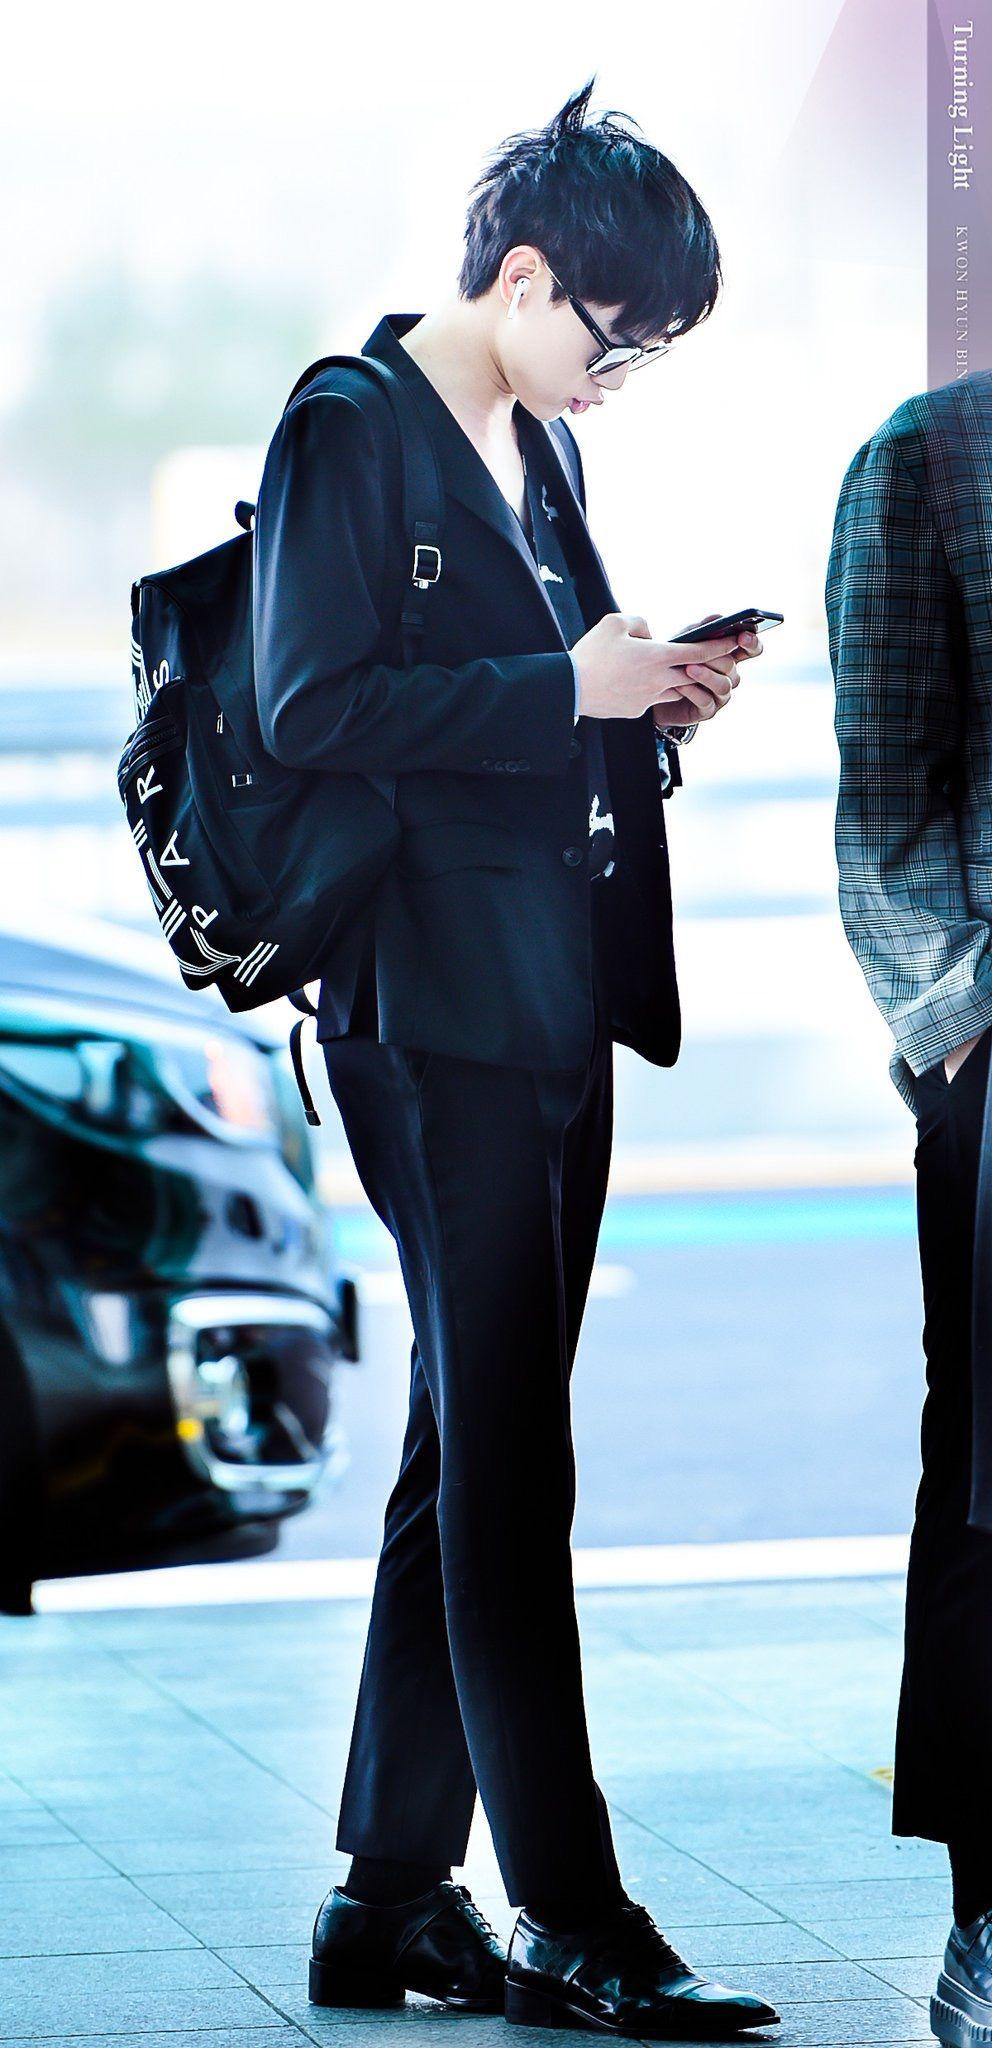 Kwon Hyunbin 可愛い